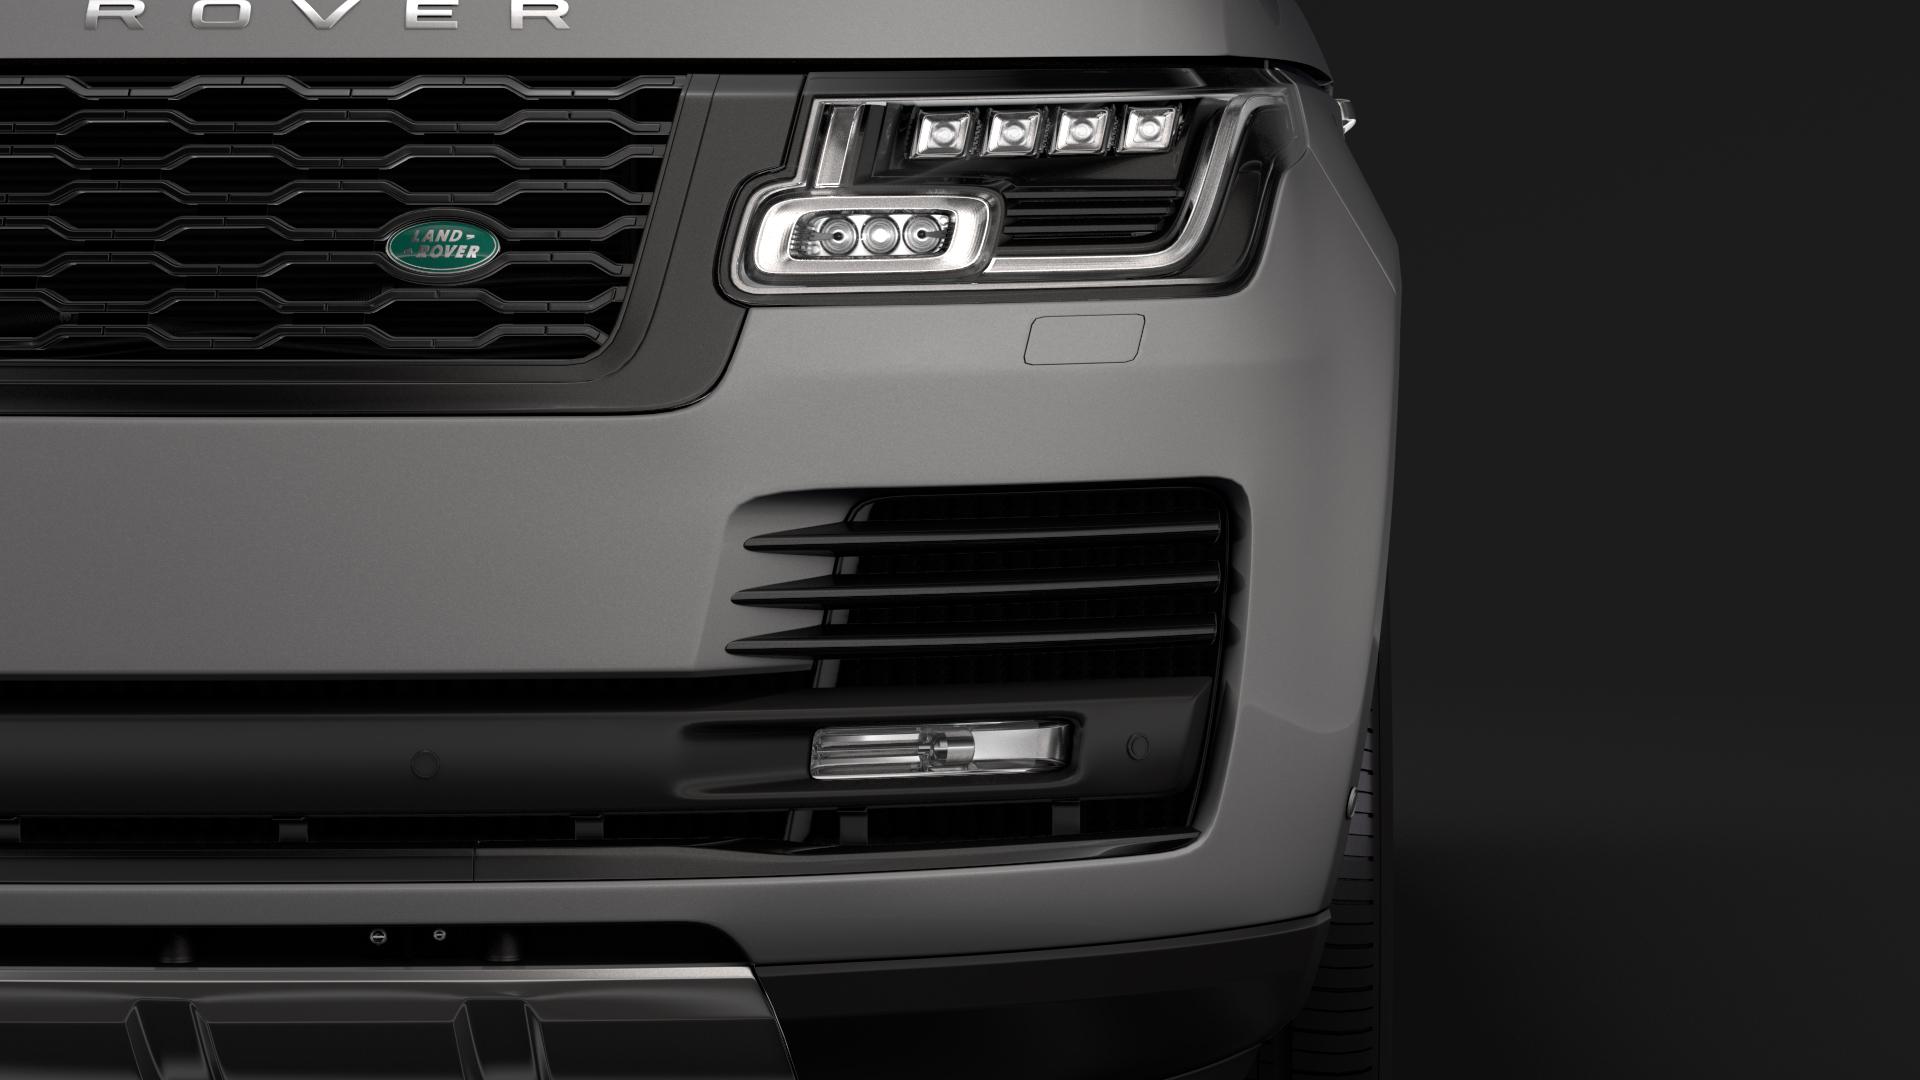 range rover vogue lwb l405 2018 3d model max fbx c4d lwo ma mb hrc xsi obj 277522